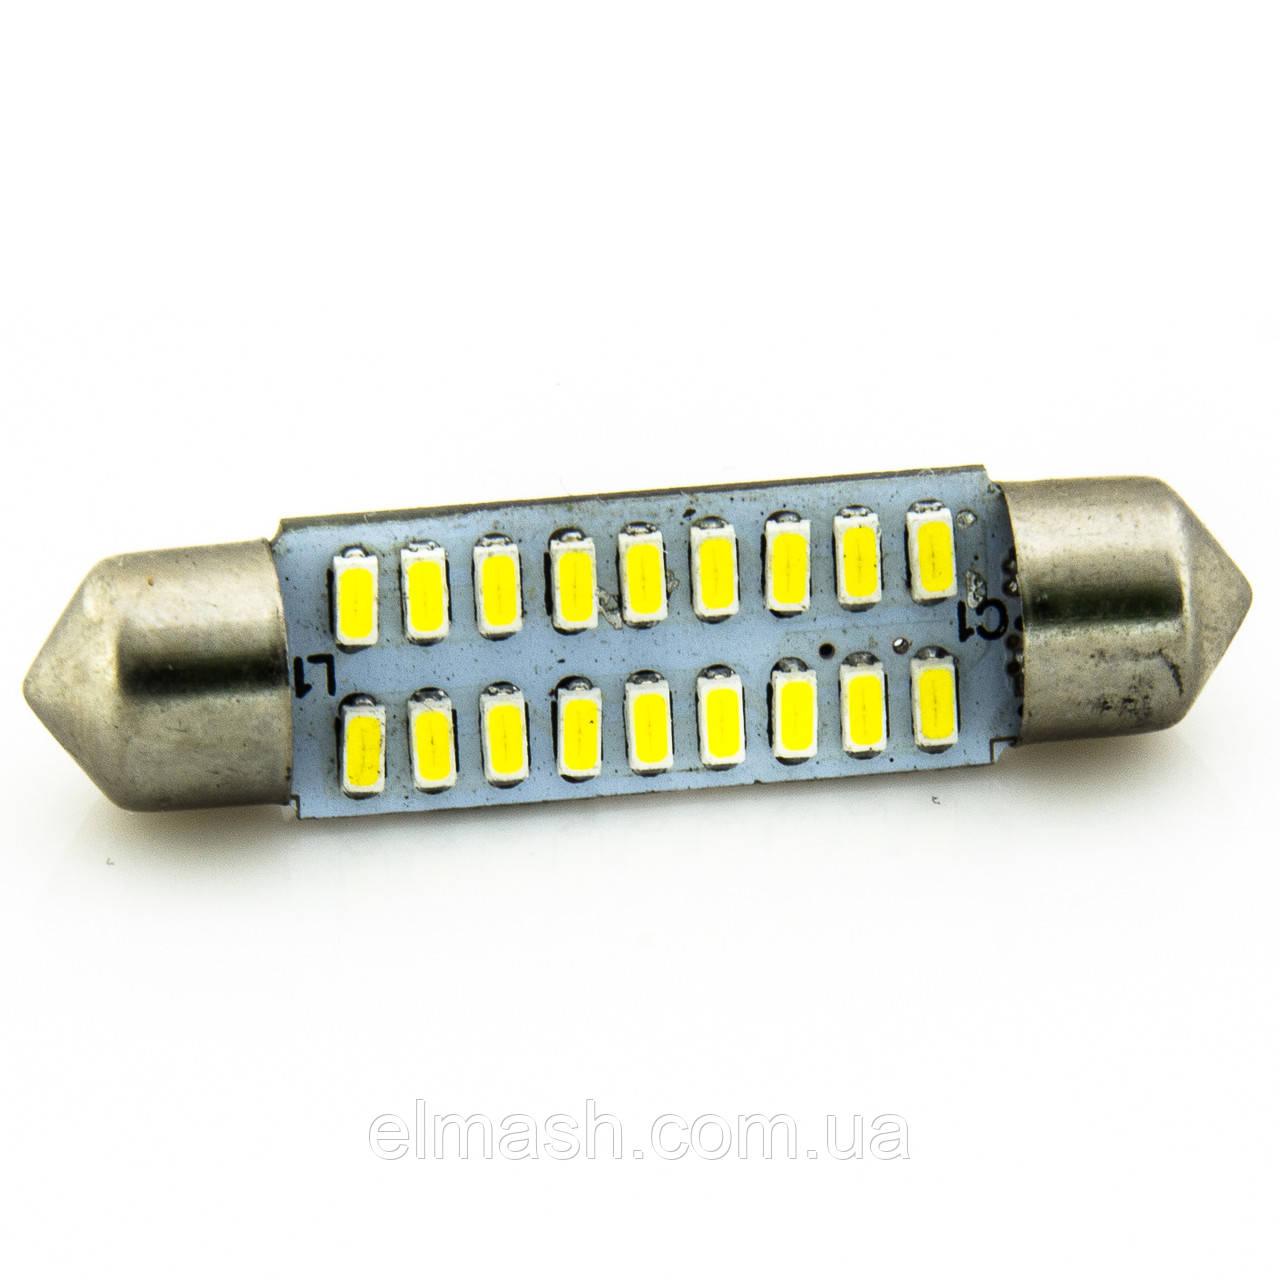 Лампа LED 12V AC (C5W) 18SMD 3014 42мм 280Lm БЕЛЫЙ